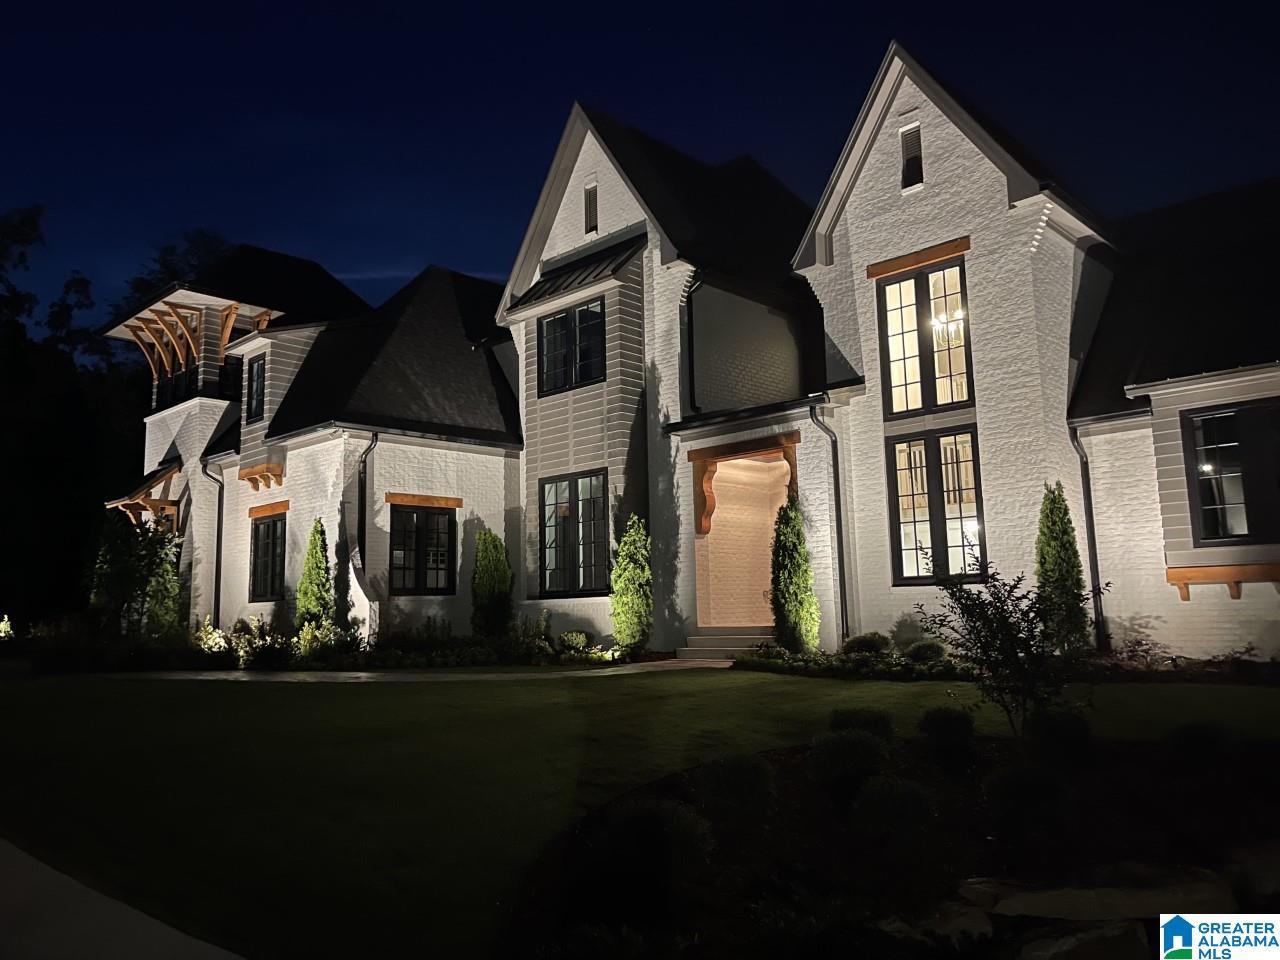 41 new home listings wowing Birmingham—Aug. 13-15